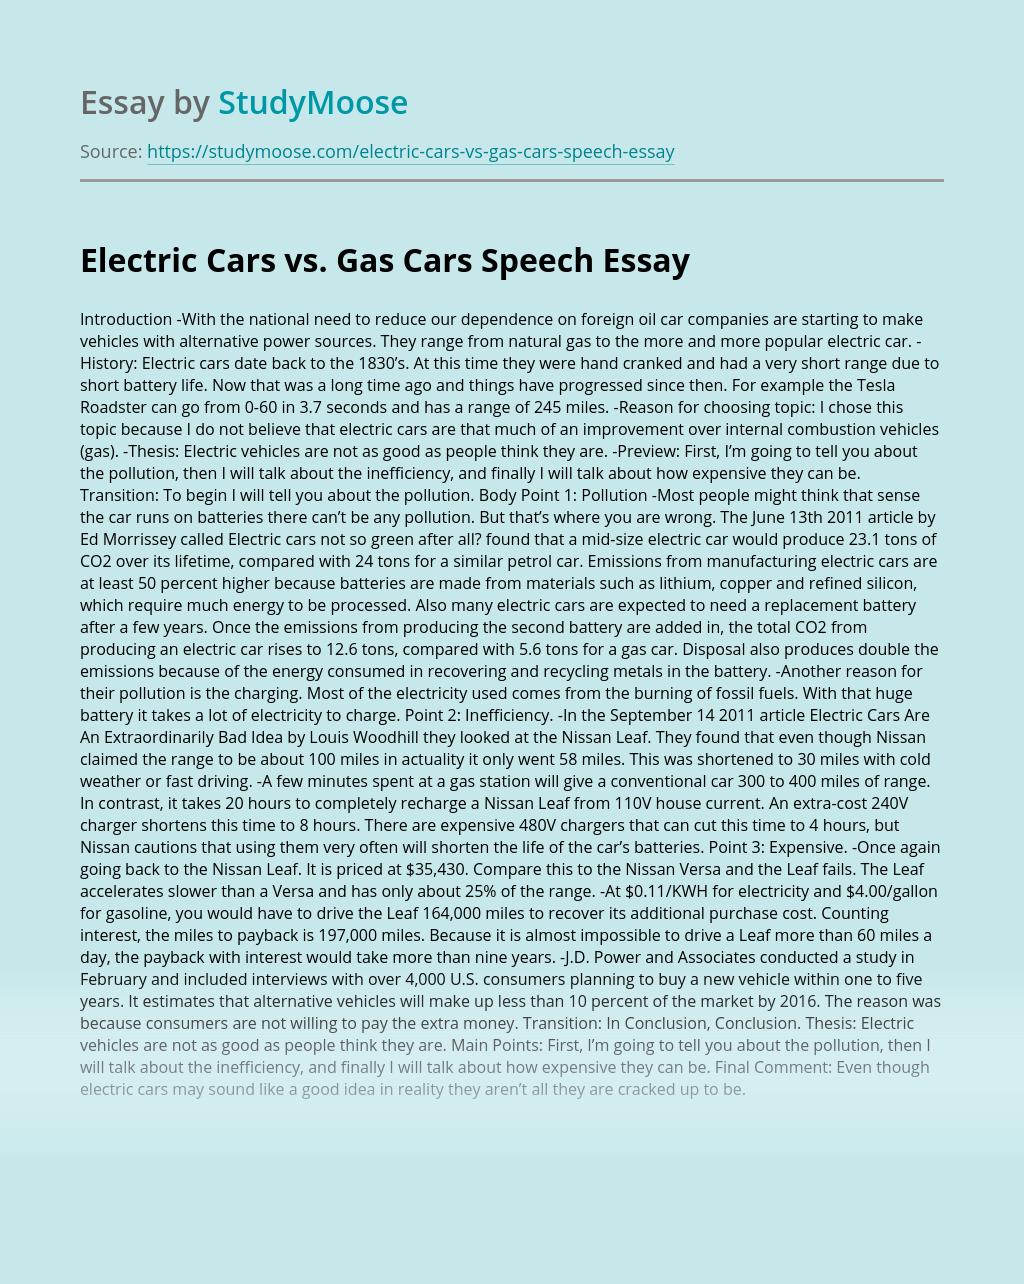 Electric Cars vs. Gas Cars Speech